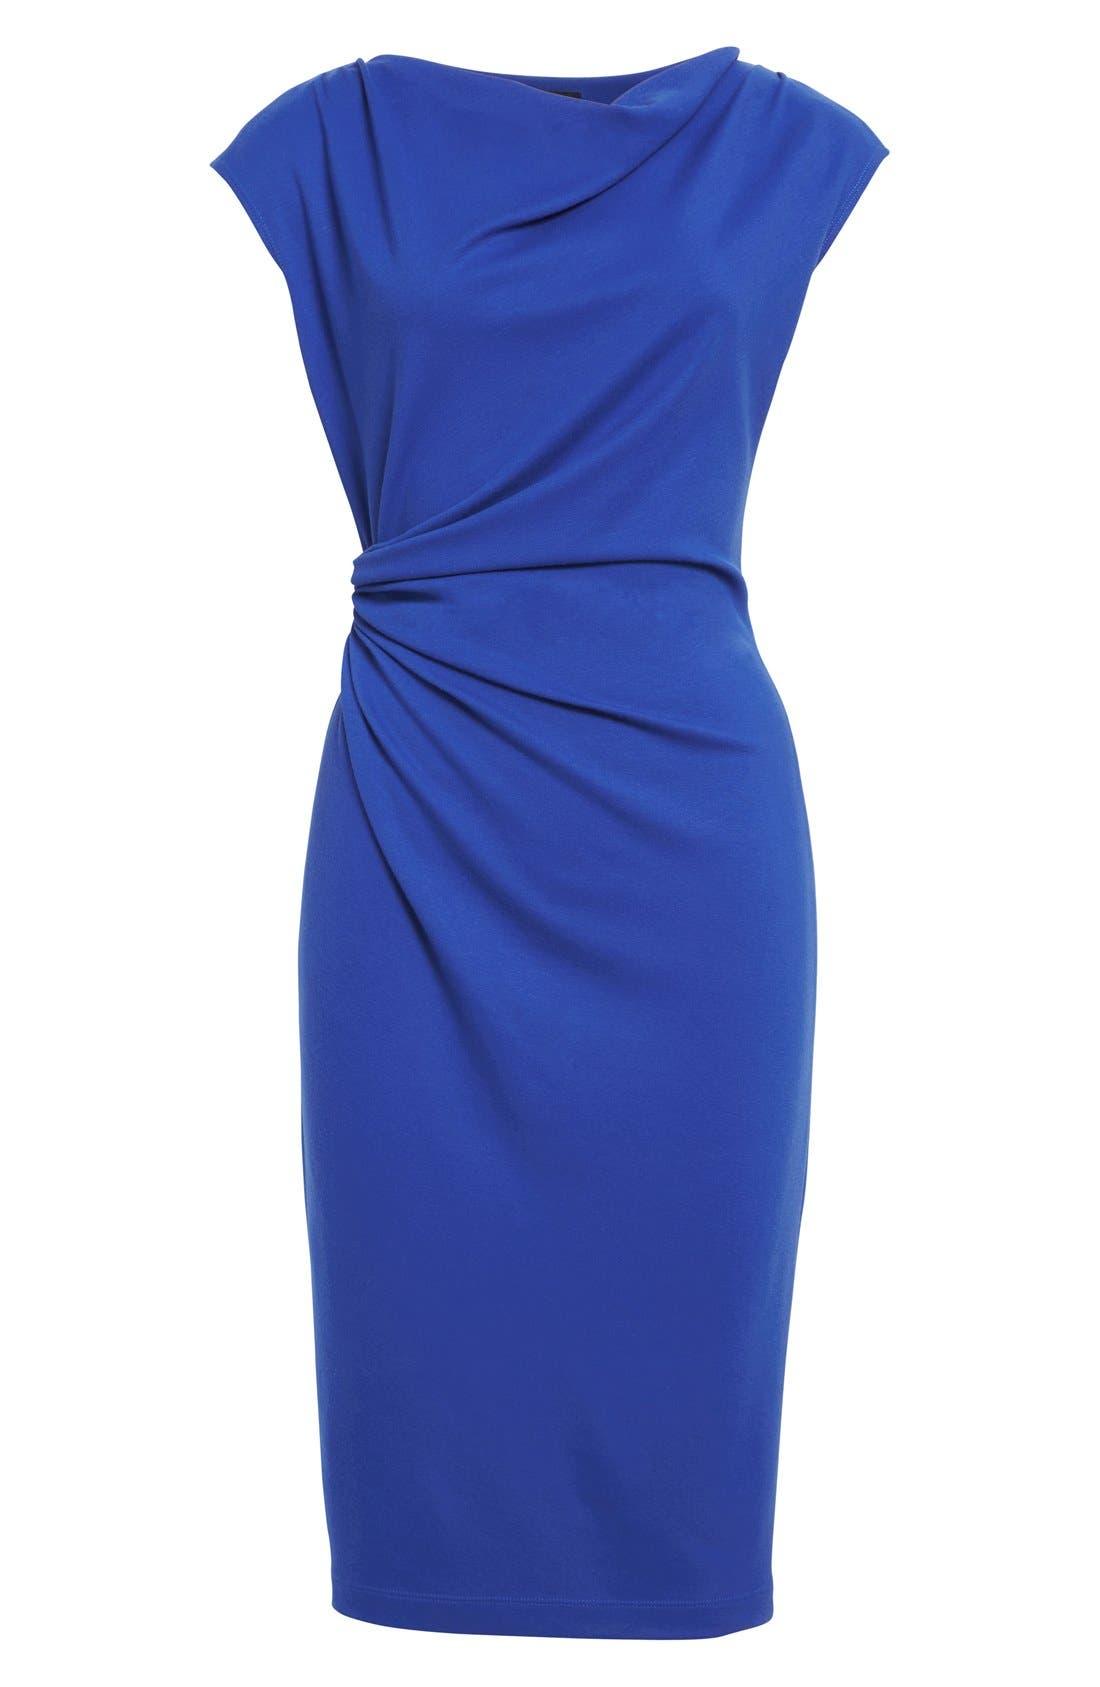 Alternate Image 4  - Lafayette 148 New York Drape Neck Ponte Dress (Regular & Petite)